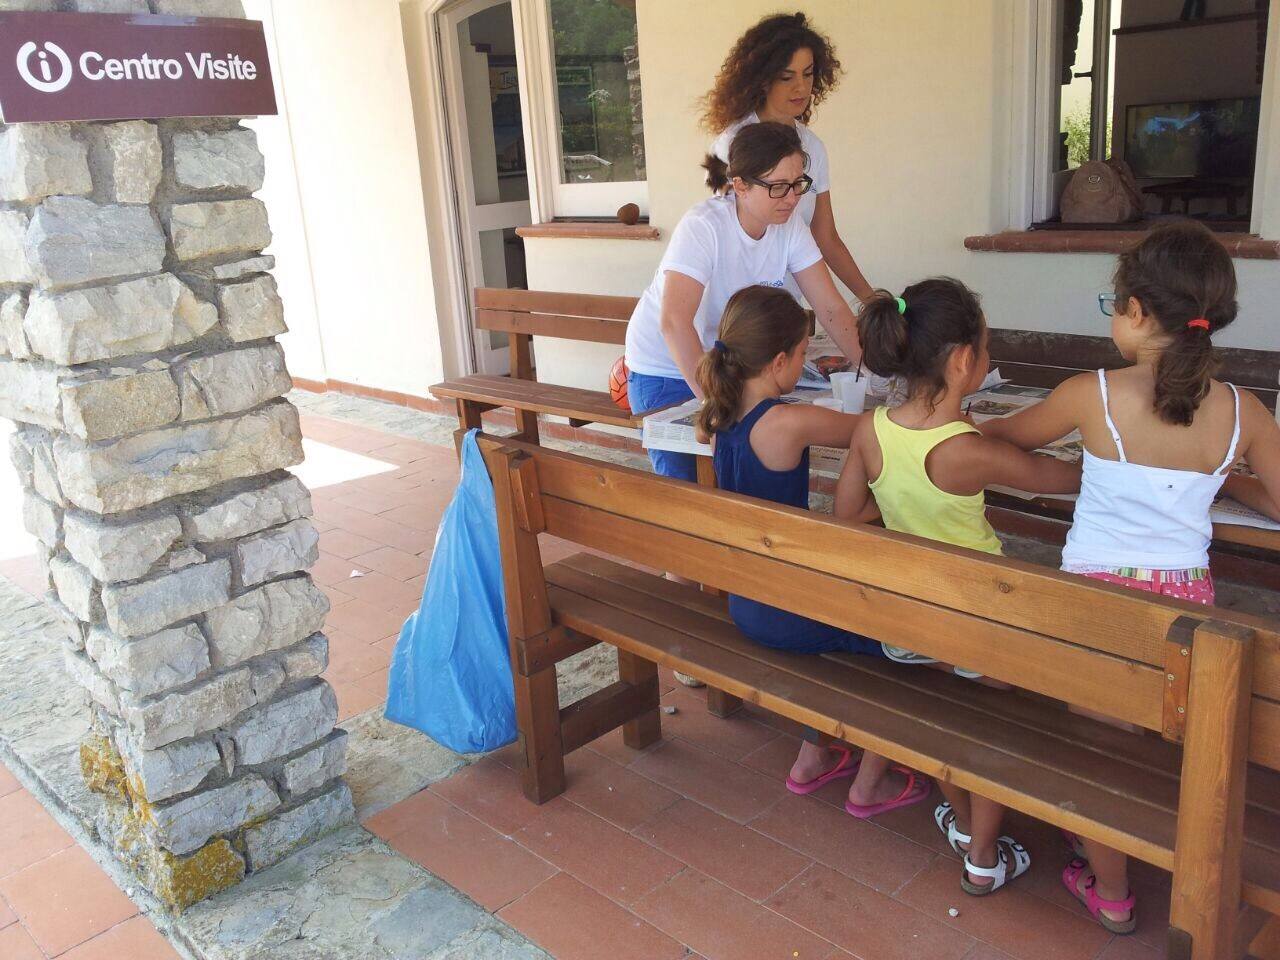 Agropoli: trekking, equitazione, mountain bike, tiro con l'arco e kayak per i bambini